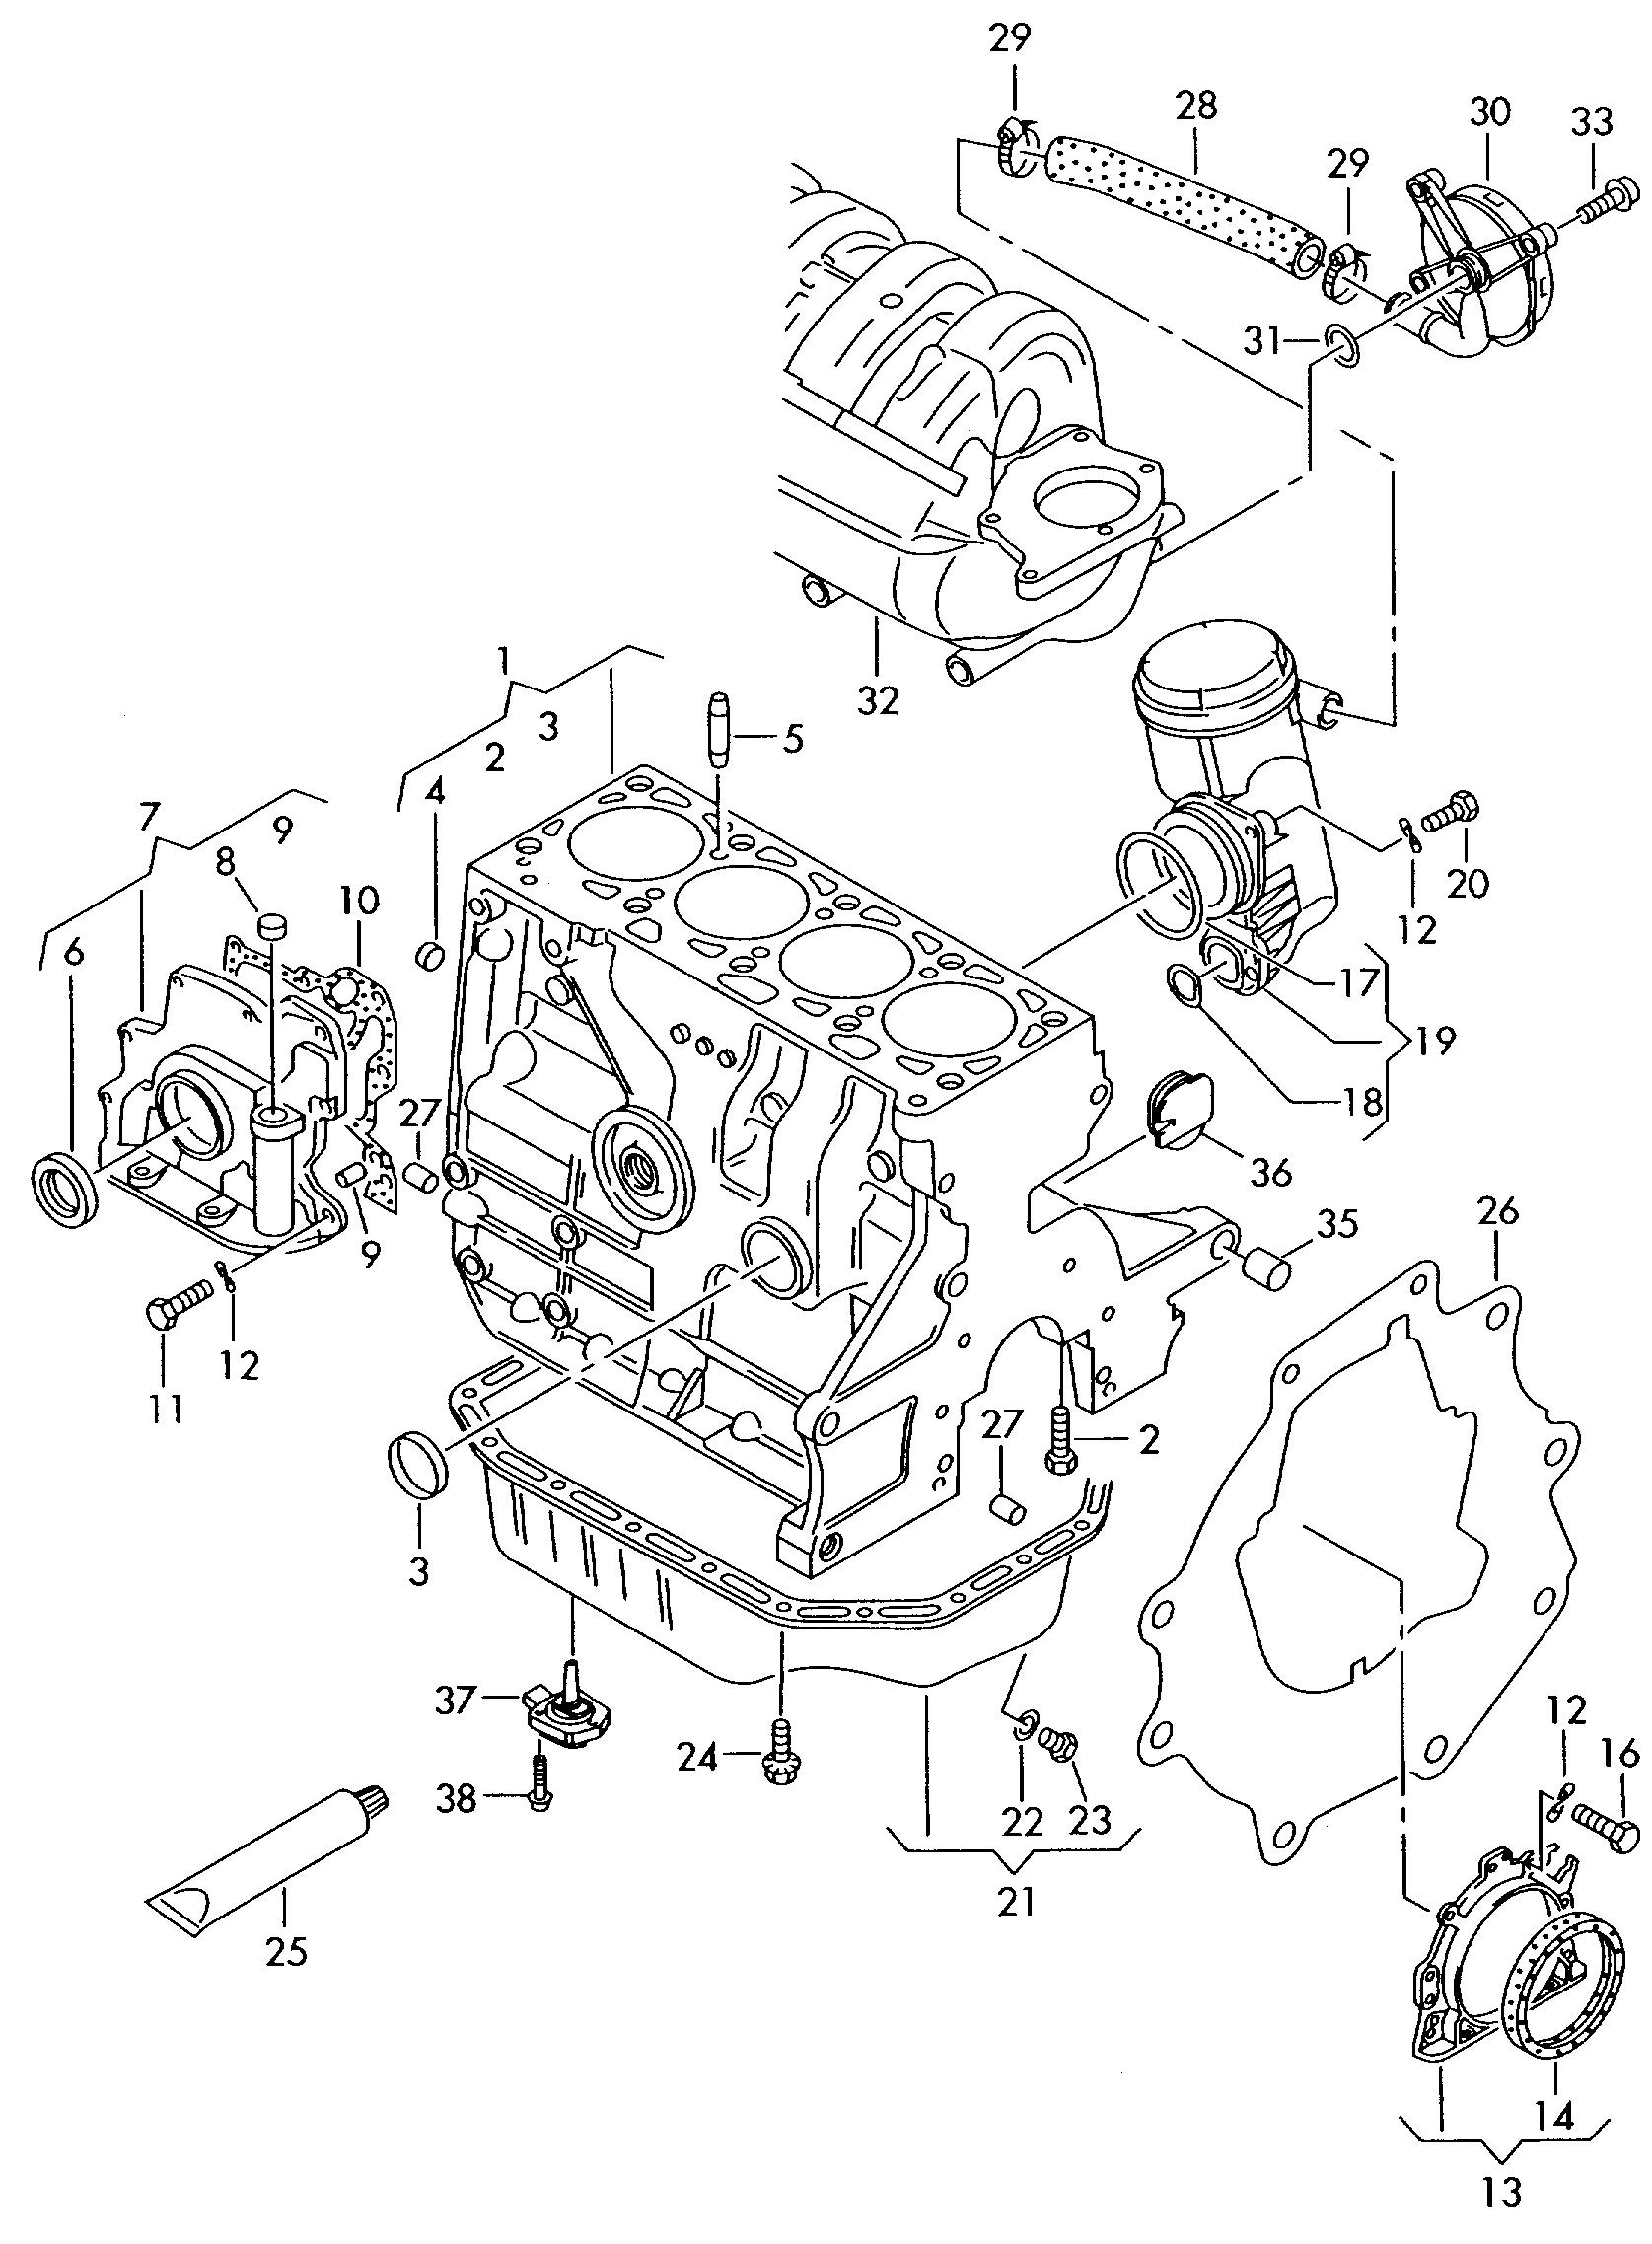 Volkswagen Golf R32 2002 Cylinder Block With Pistons Vw Engine Piston Diagram Vag Etka